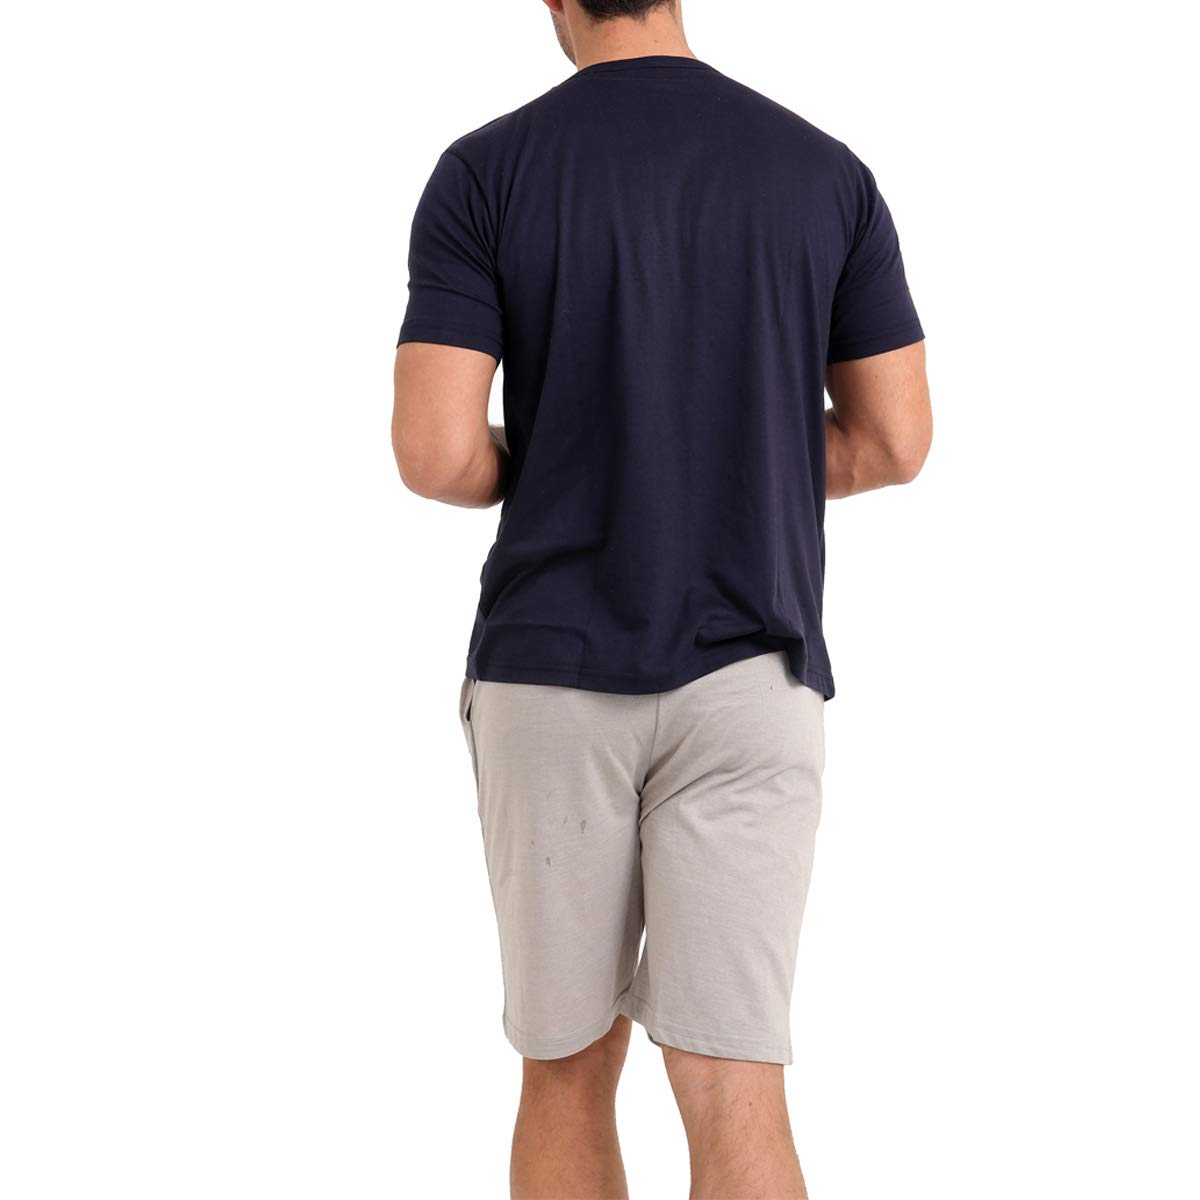 Mens T Shirt Shorts Set Plain Crew /& Button Neck Pyjamas Pjs Loungewear Set Multipack Gift Idea